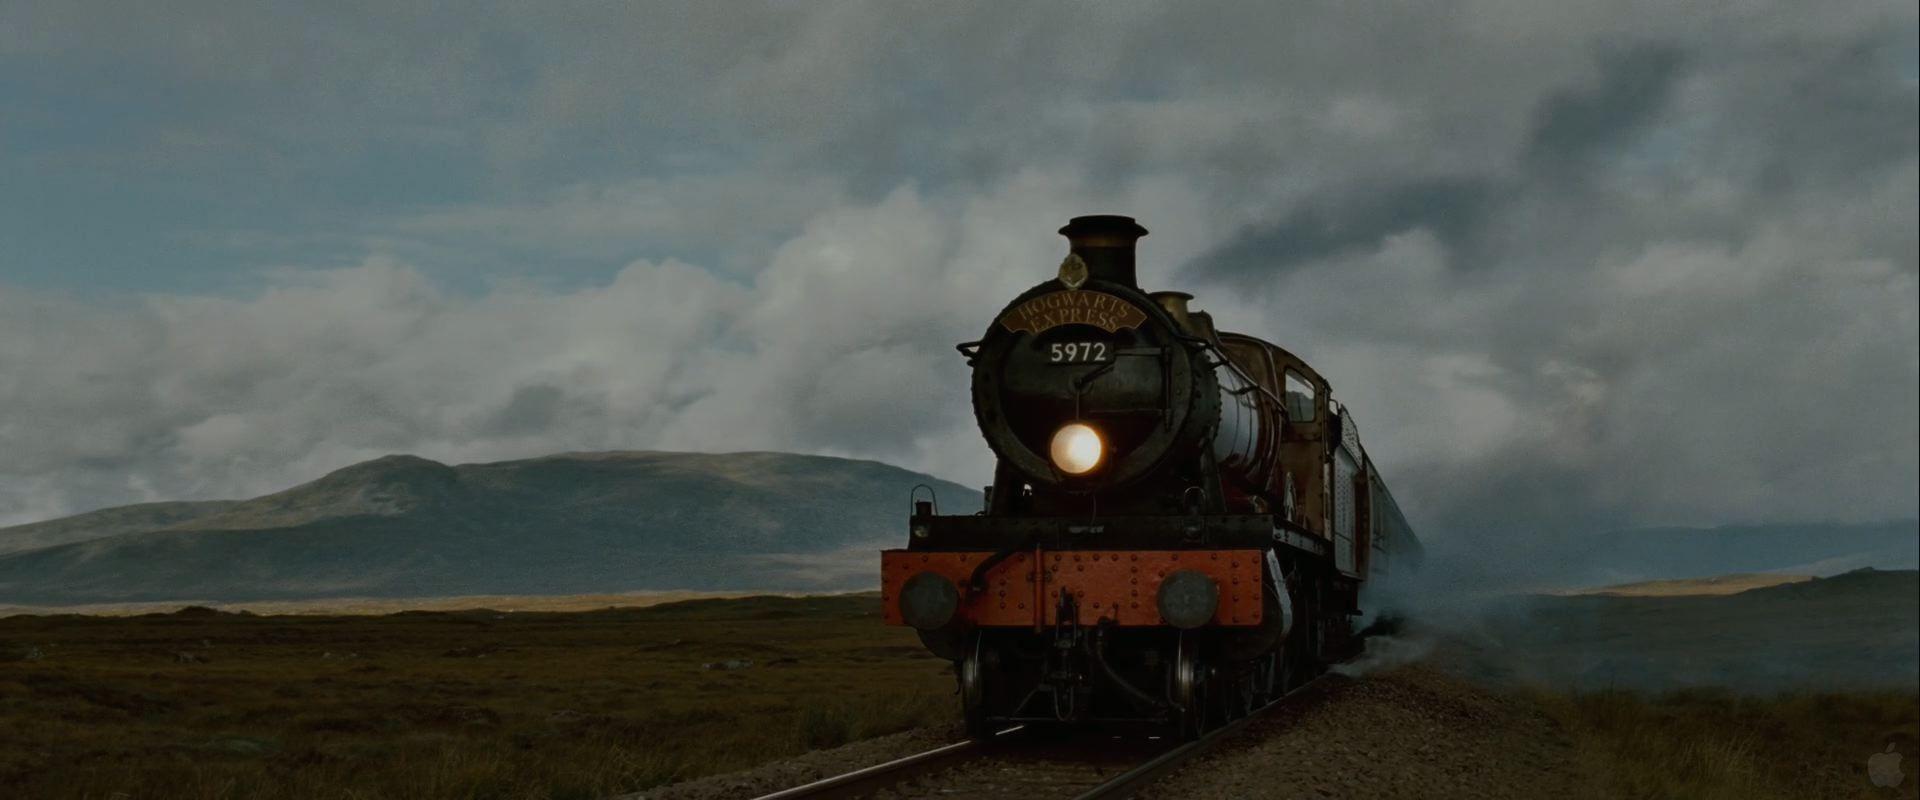 Harry Potter Wallpaper Hogwarts Burning